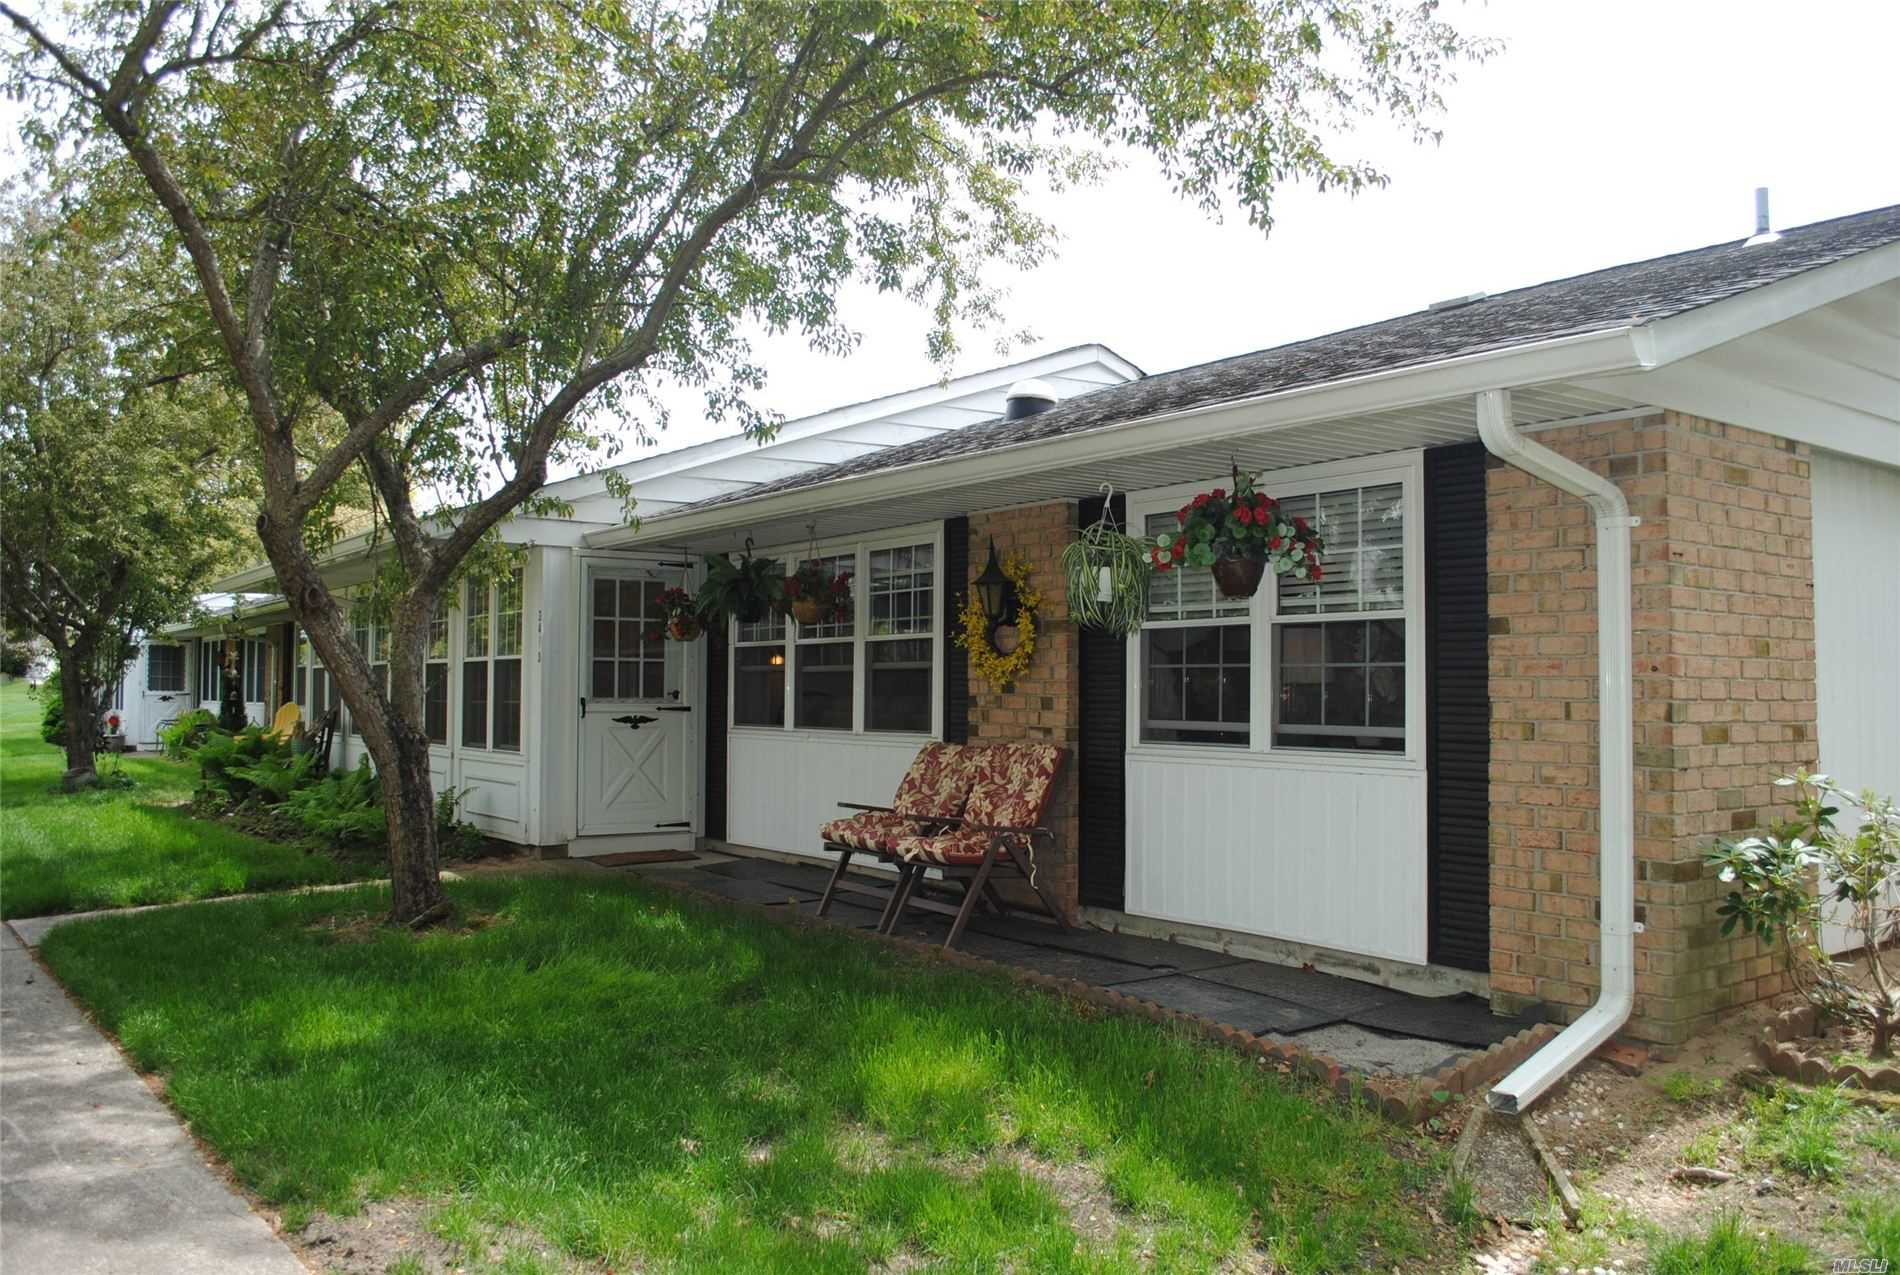 Property for sale at 341D Woodbridge Dr # 55, Ridge NY 11961, Ridge,  New York 11961